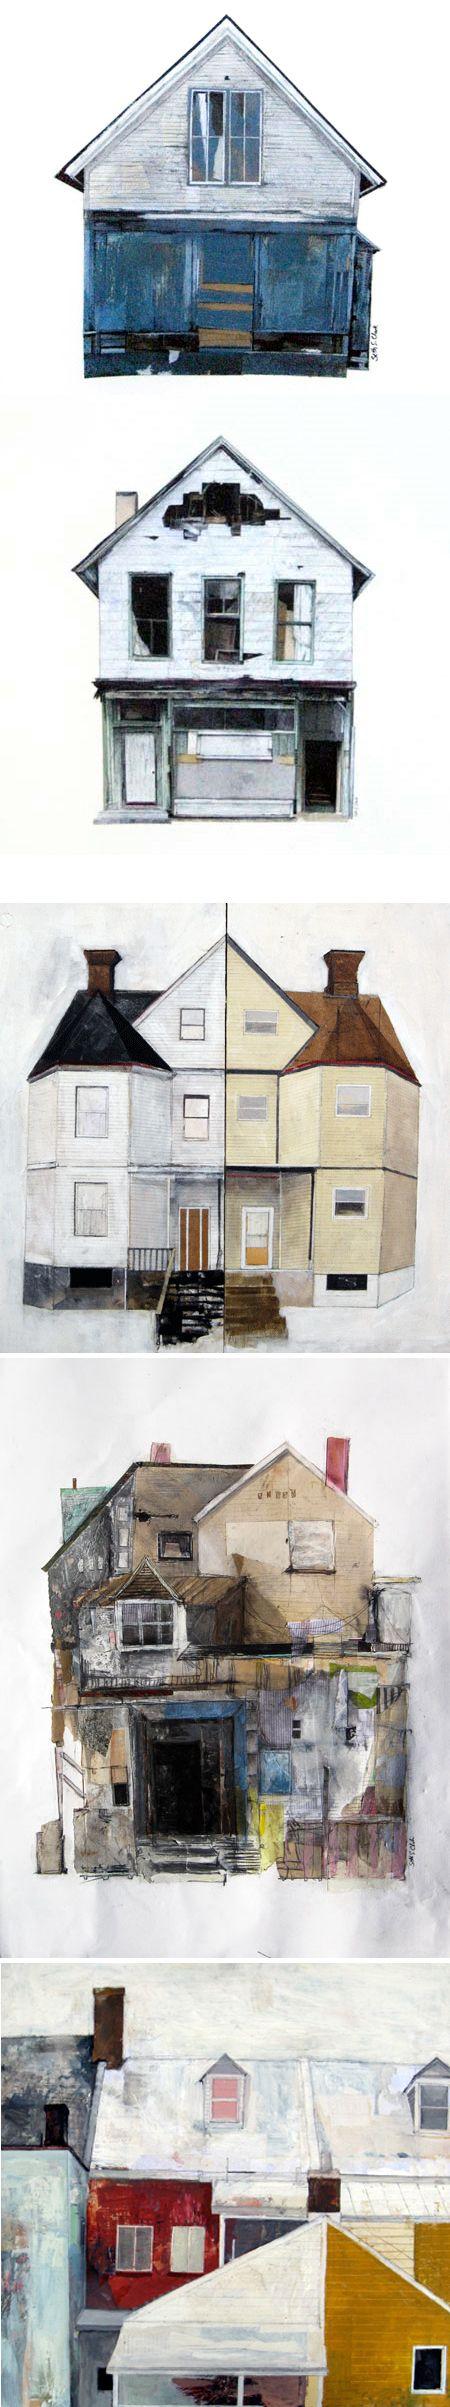 Seth Clark house collages http://sethsclark.com/work/index.php?/art/abandoned/ #art